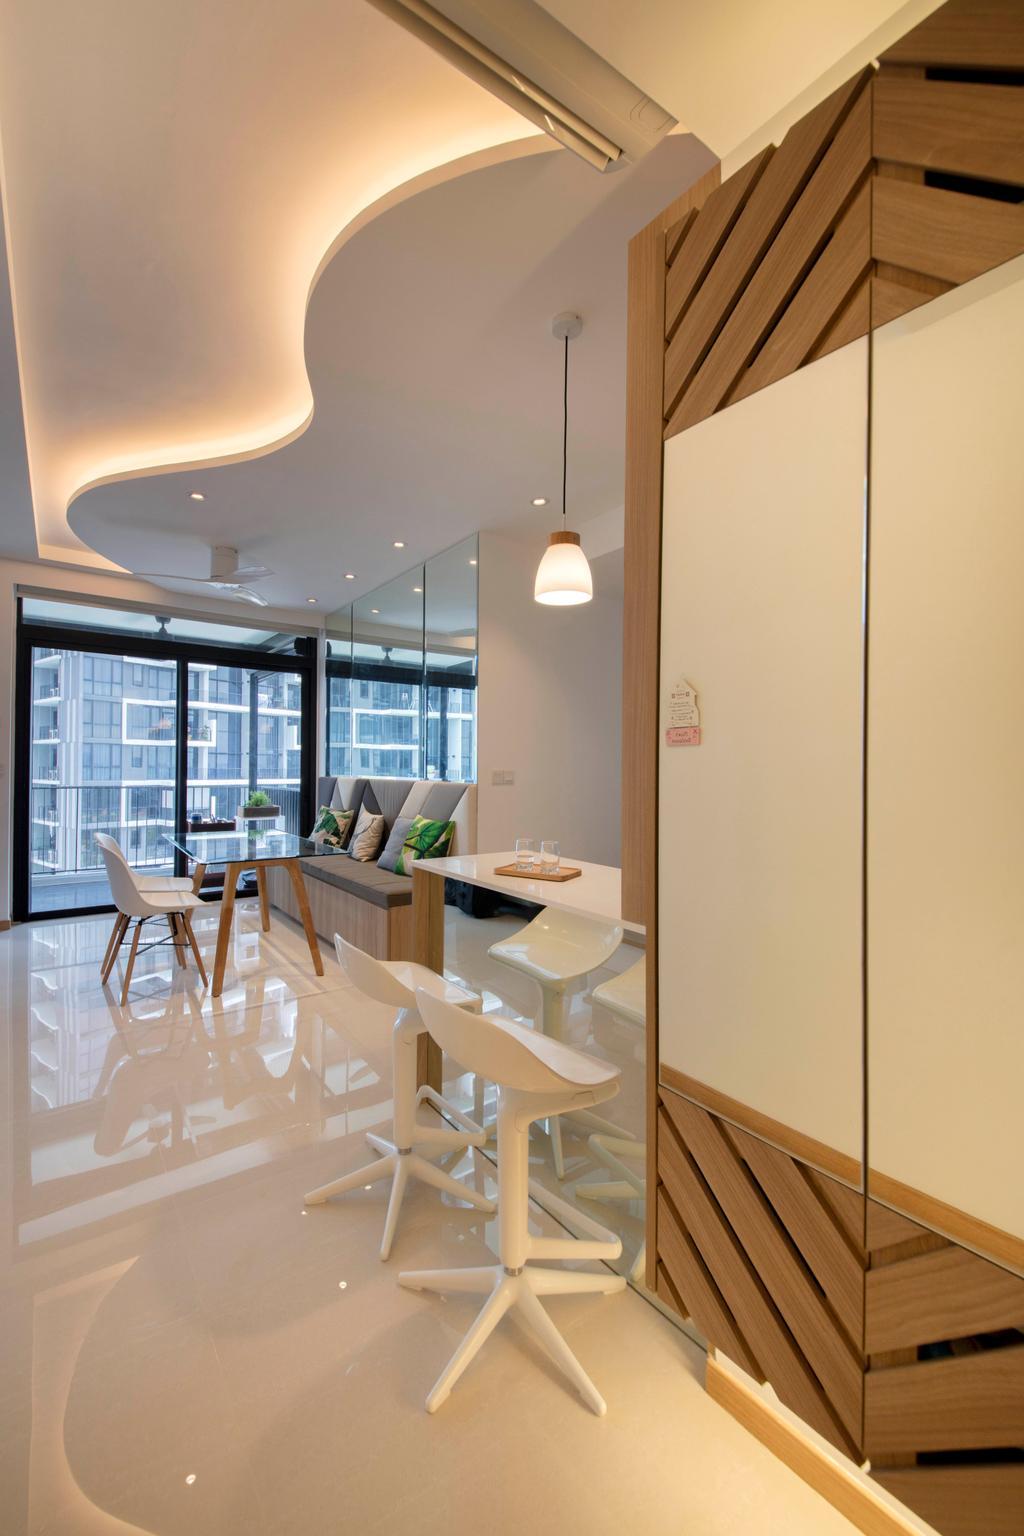 Scandinavian, Condo, The Trilinq, Interior Designer, Free Space Intent, Dining Table, Furniture, Table, Dining Room, Indoors, Interior Design, Room, Chair